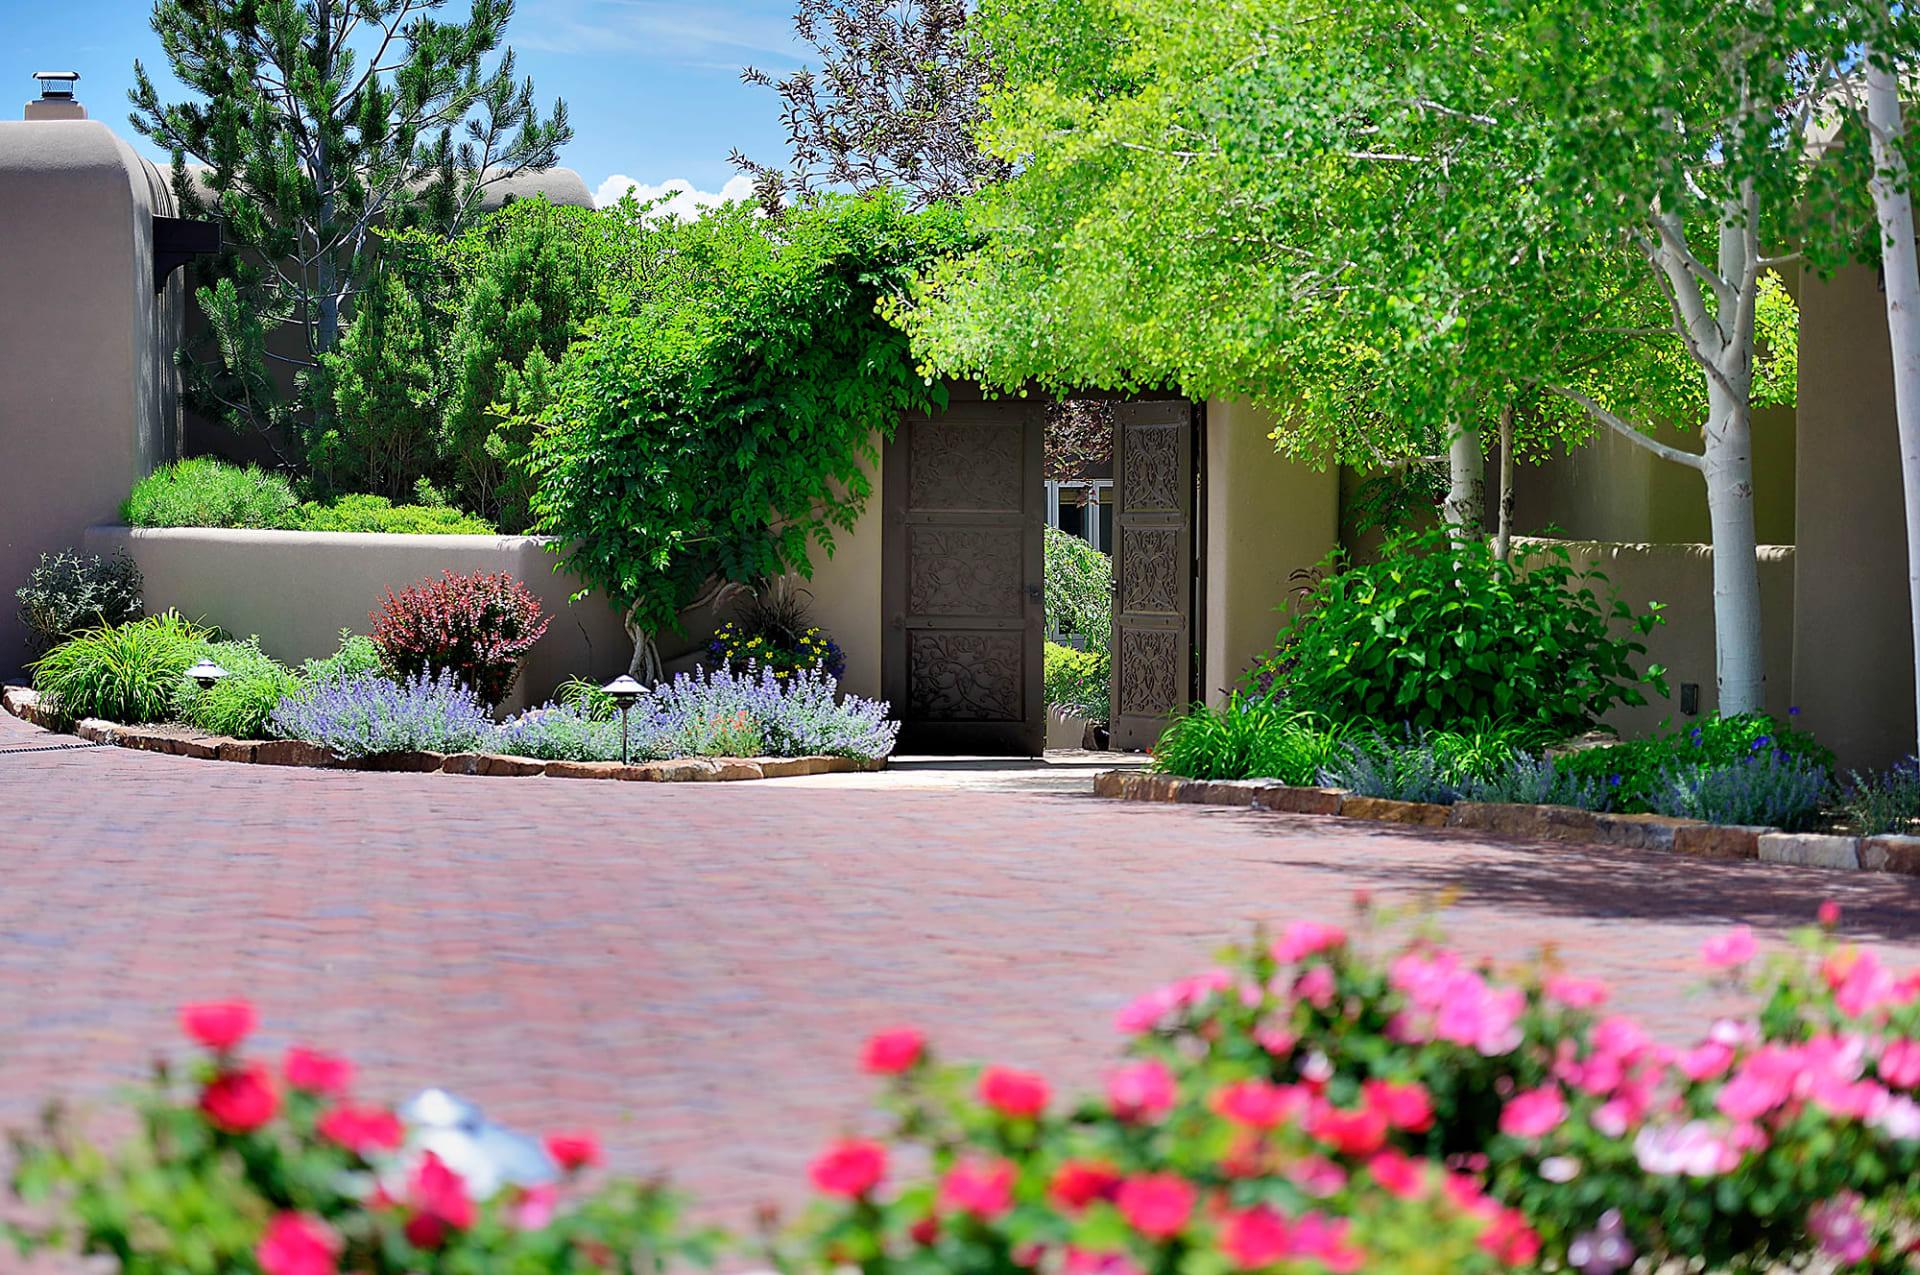 Santa Fe Real Estate image